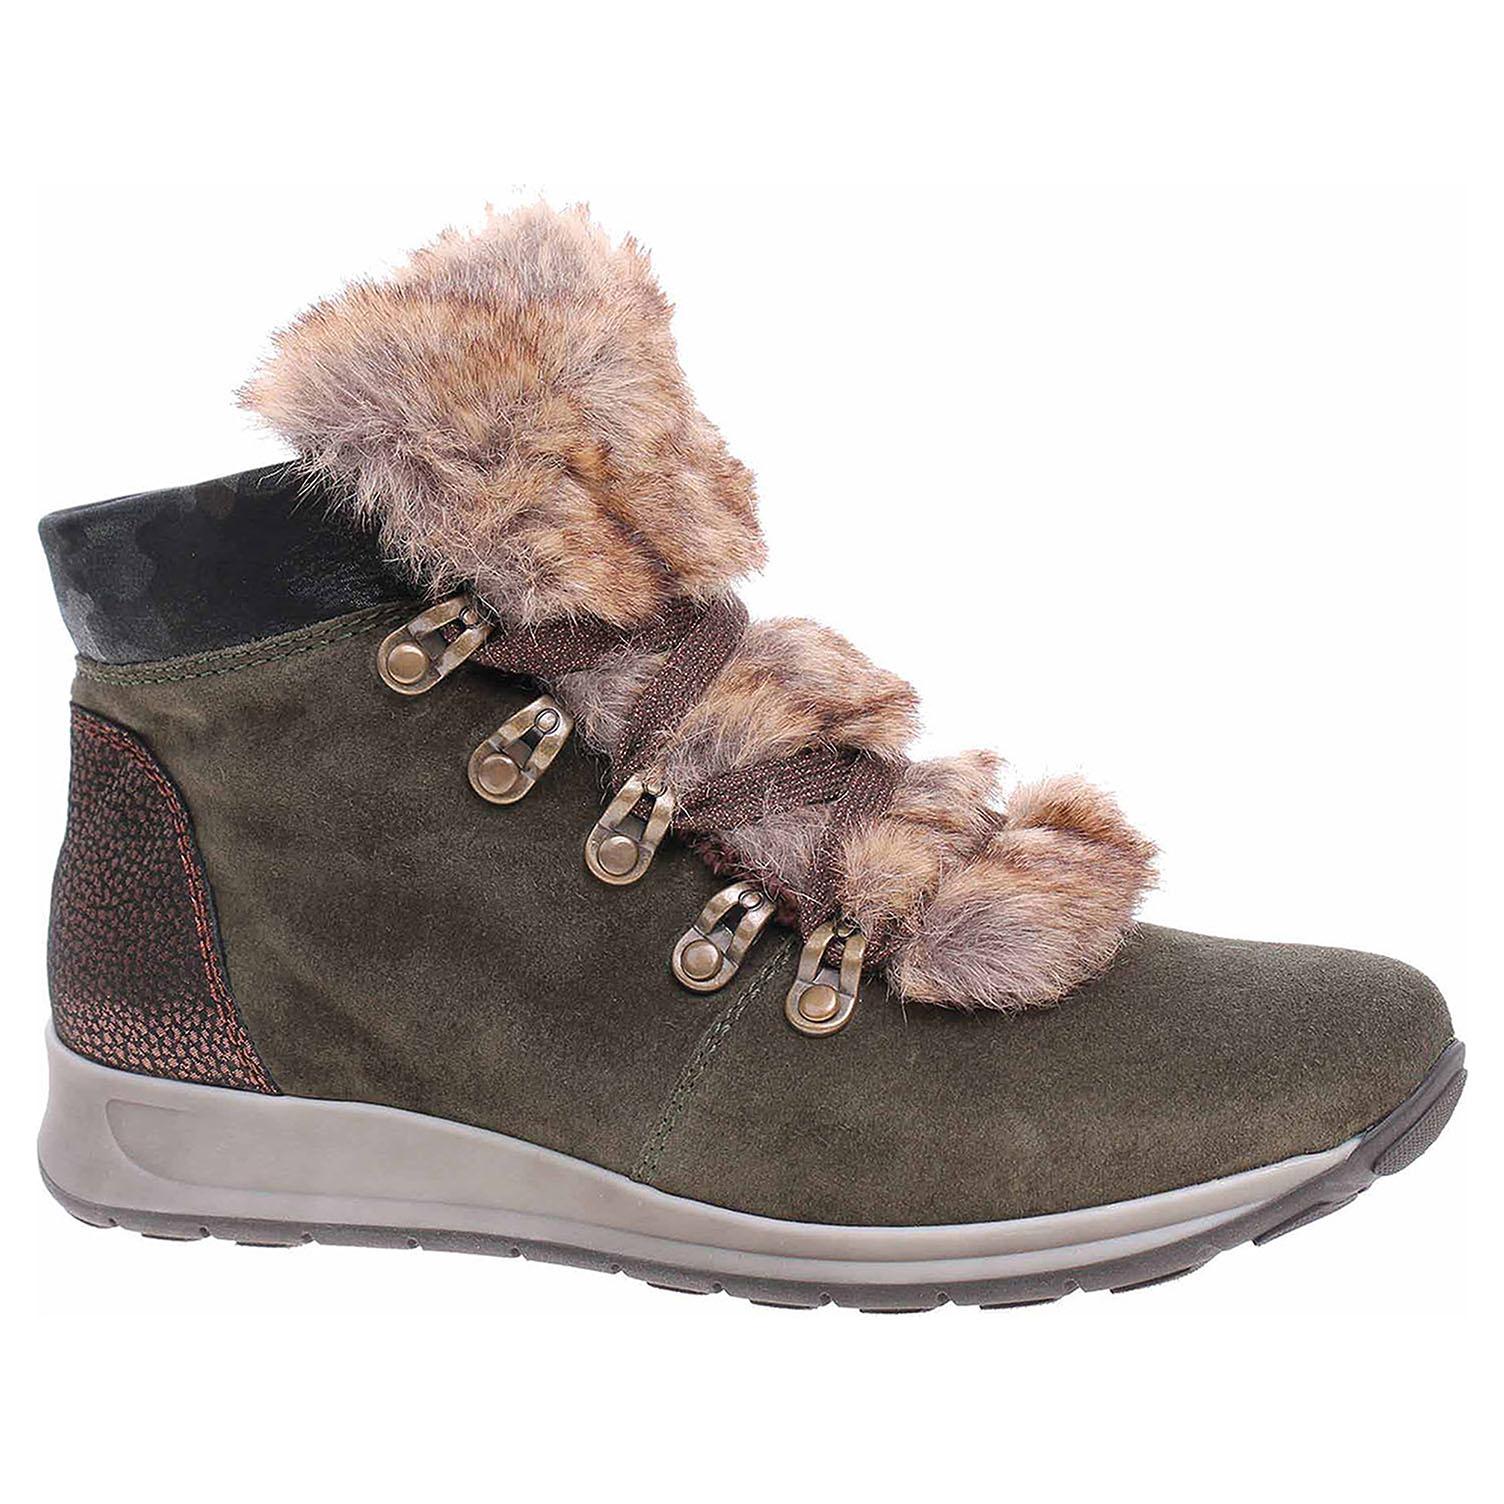 8c33fd7d3b4e Ecco Dámská kotníková obuv Ara 12-44515-78 forest-moro-copper 22400727